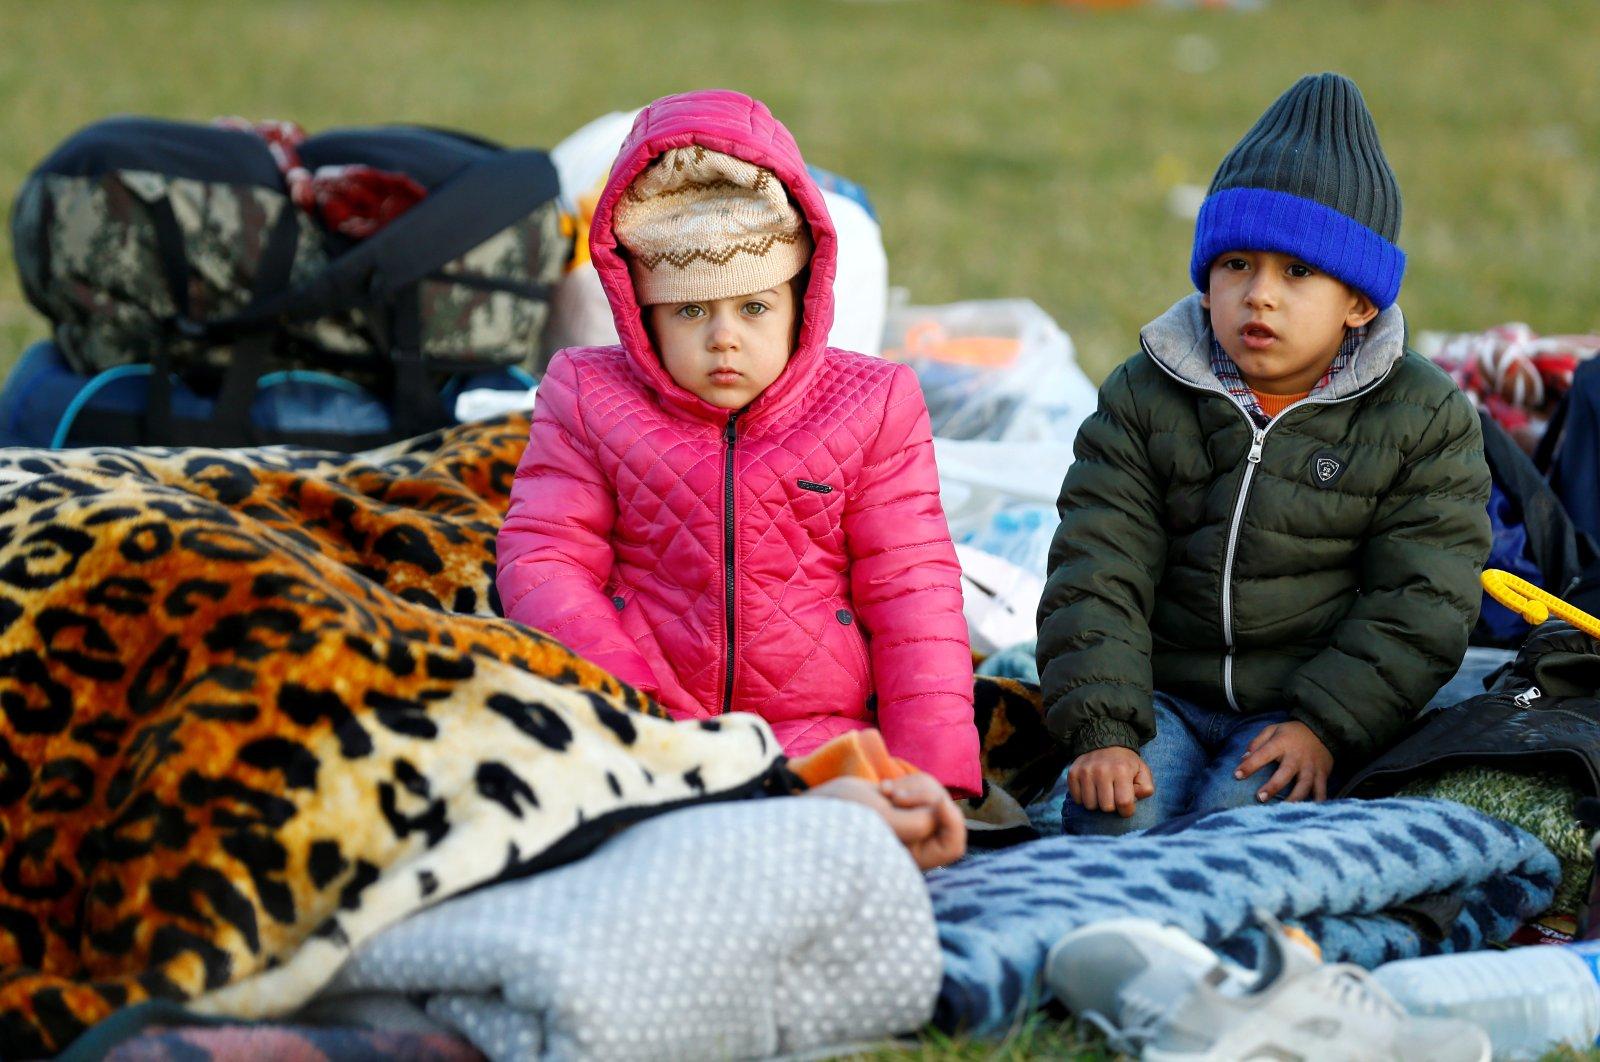 Migrant children are seen near Turkey's Pazarkule border crossing with Greece's Kastanies, near Edirne, Turkey, March 7, 2020. (Reuters Photo)